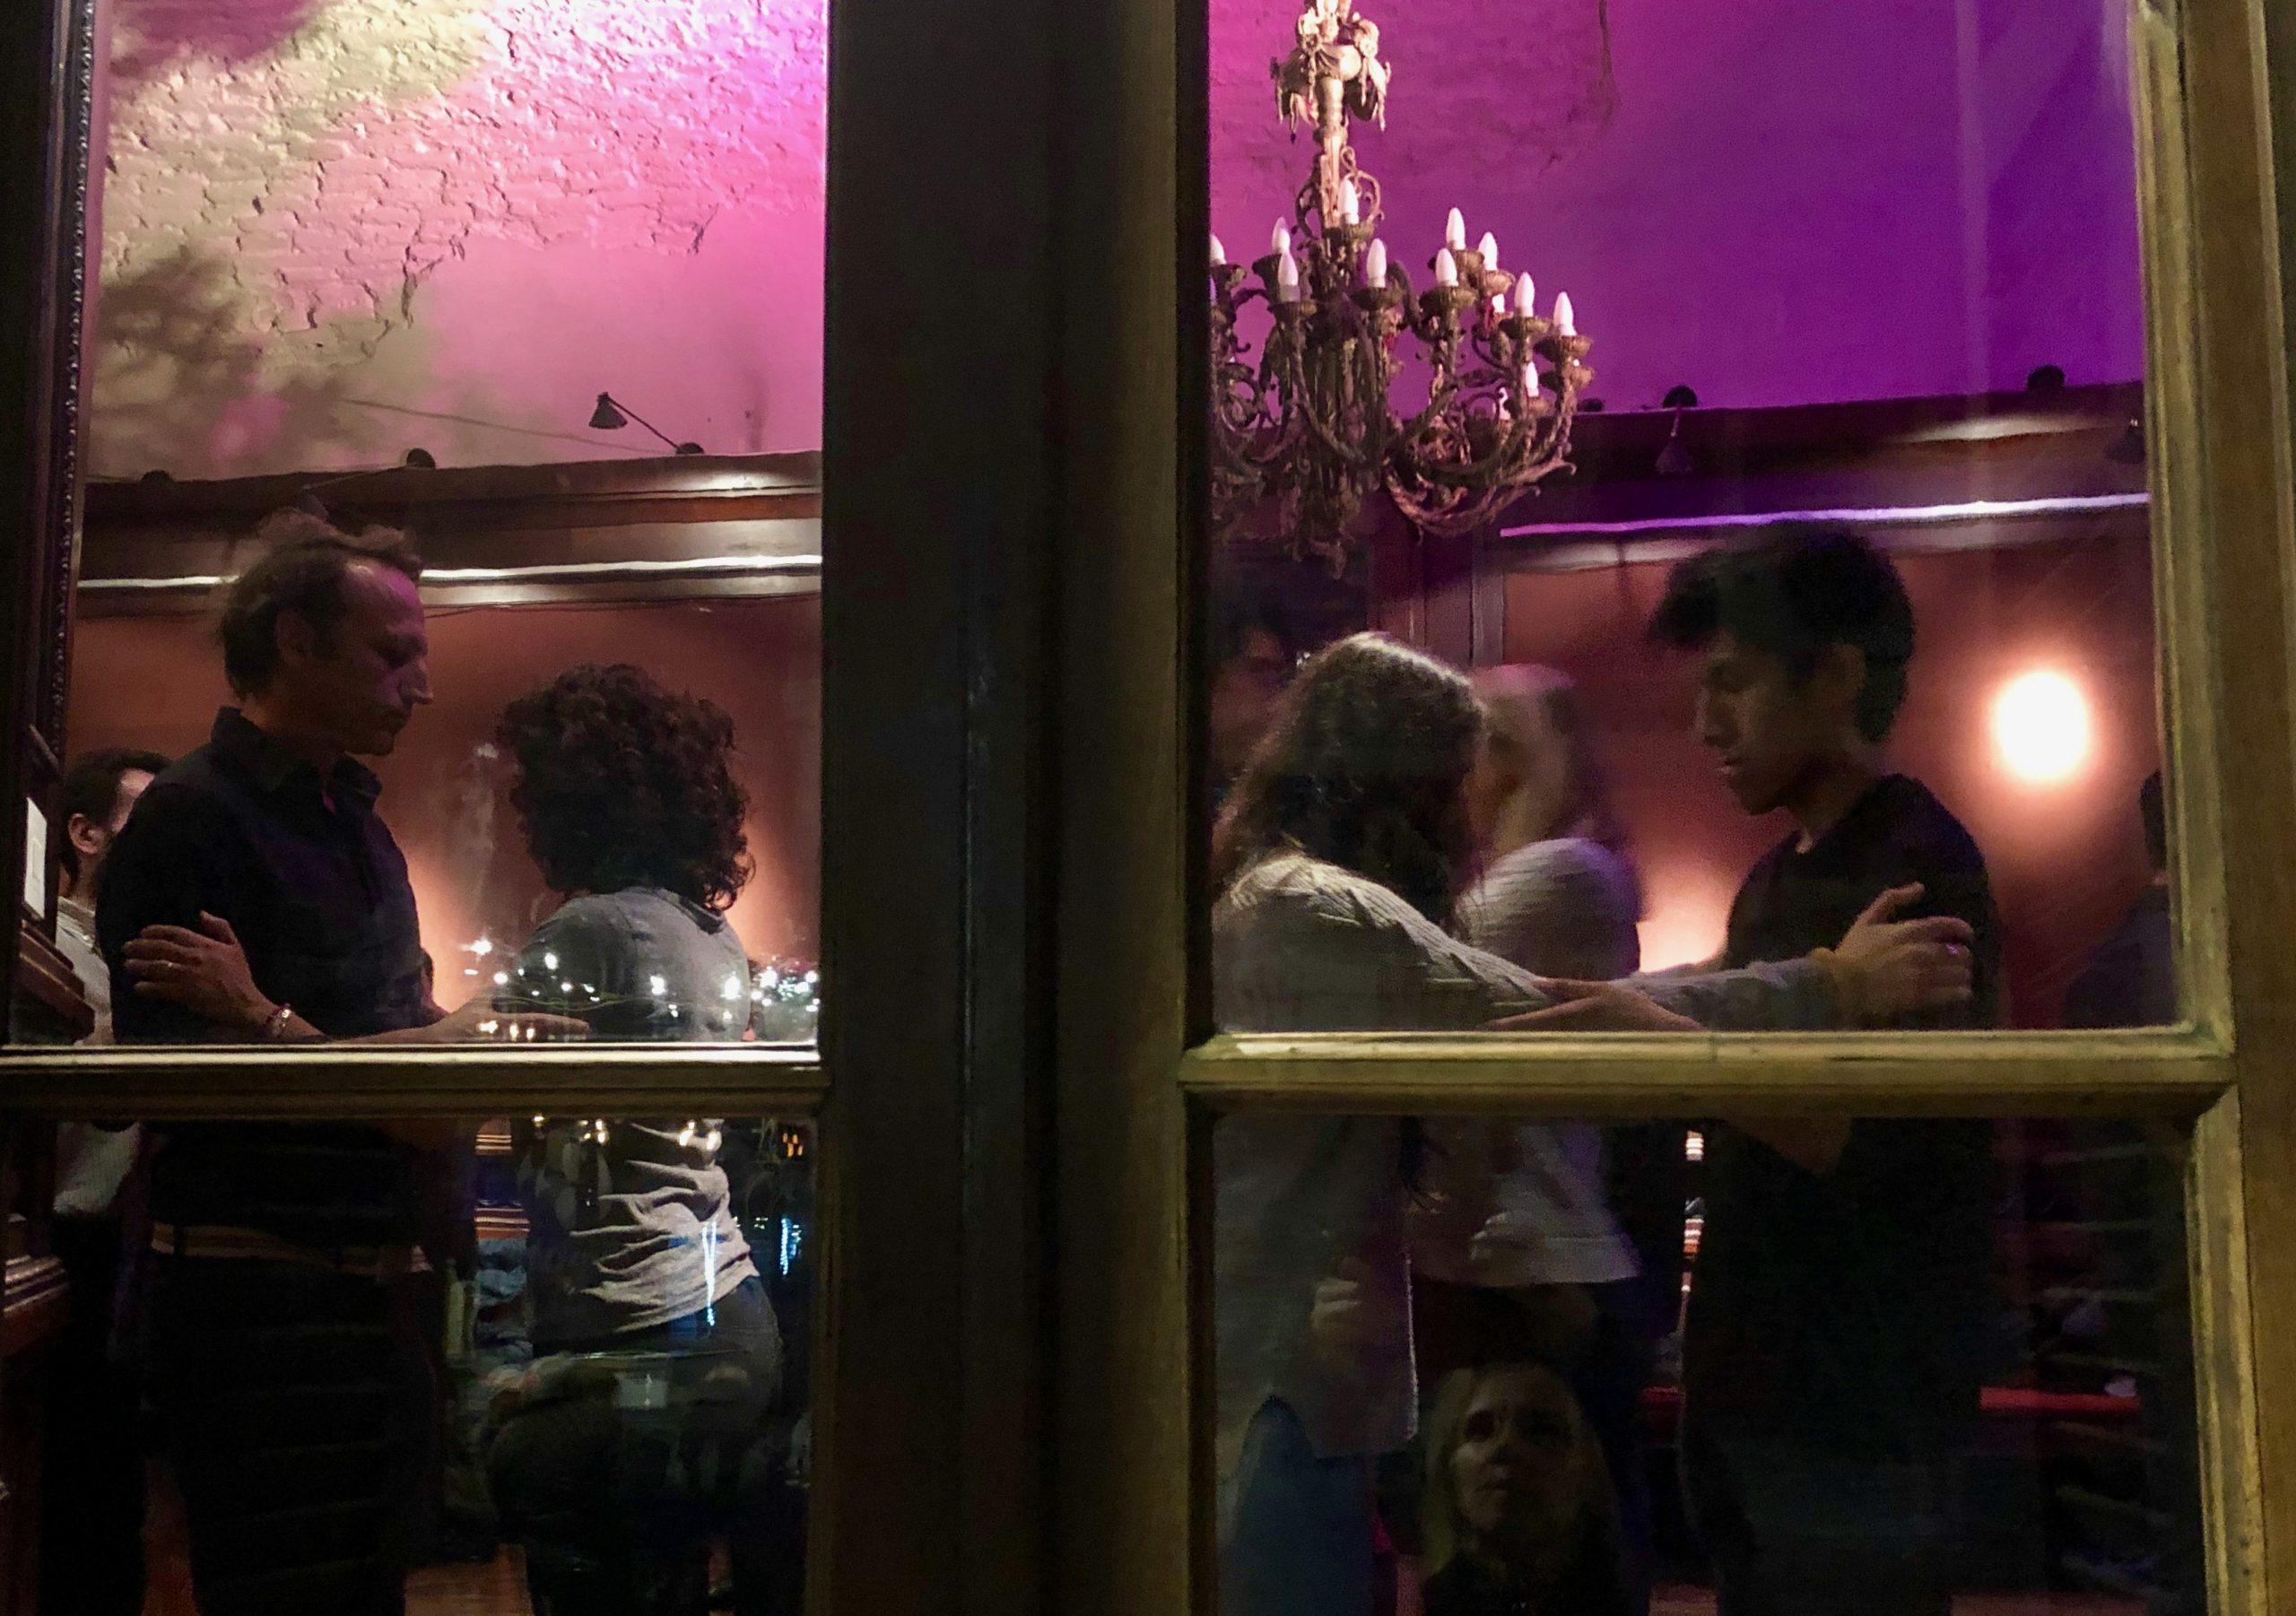 Patio de tango à la Manzana de las Luces